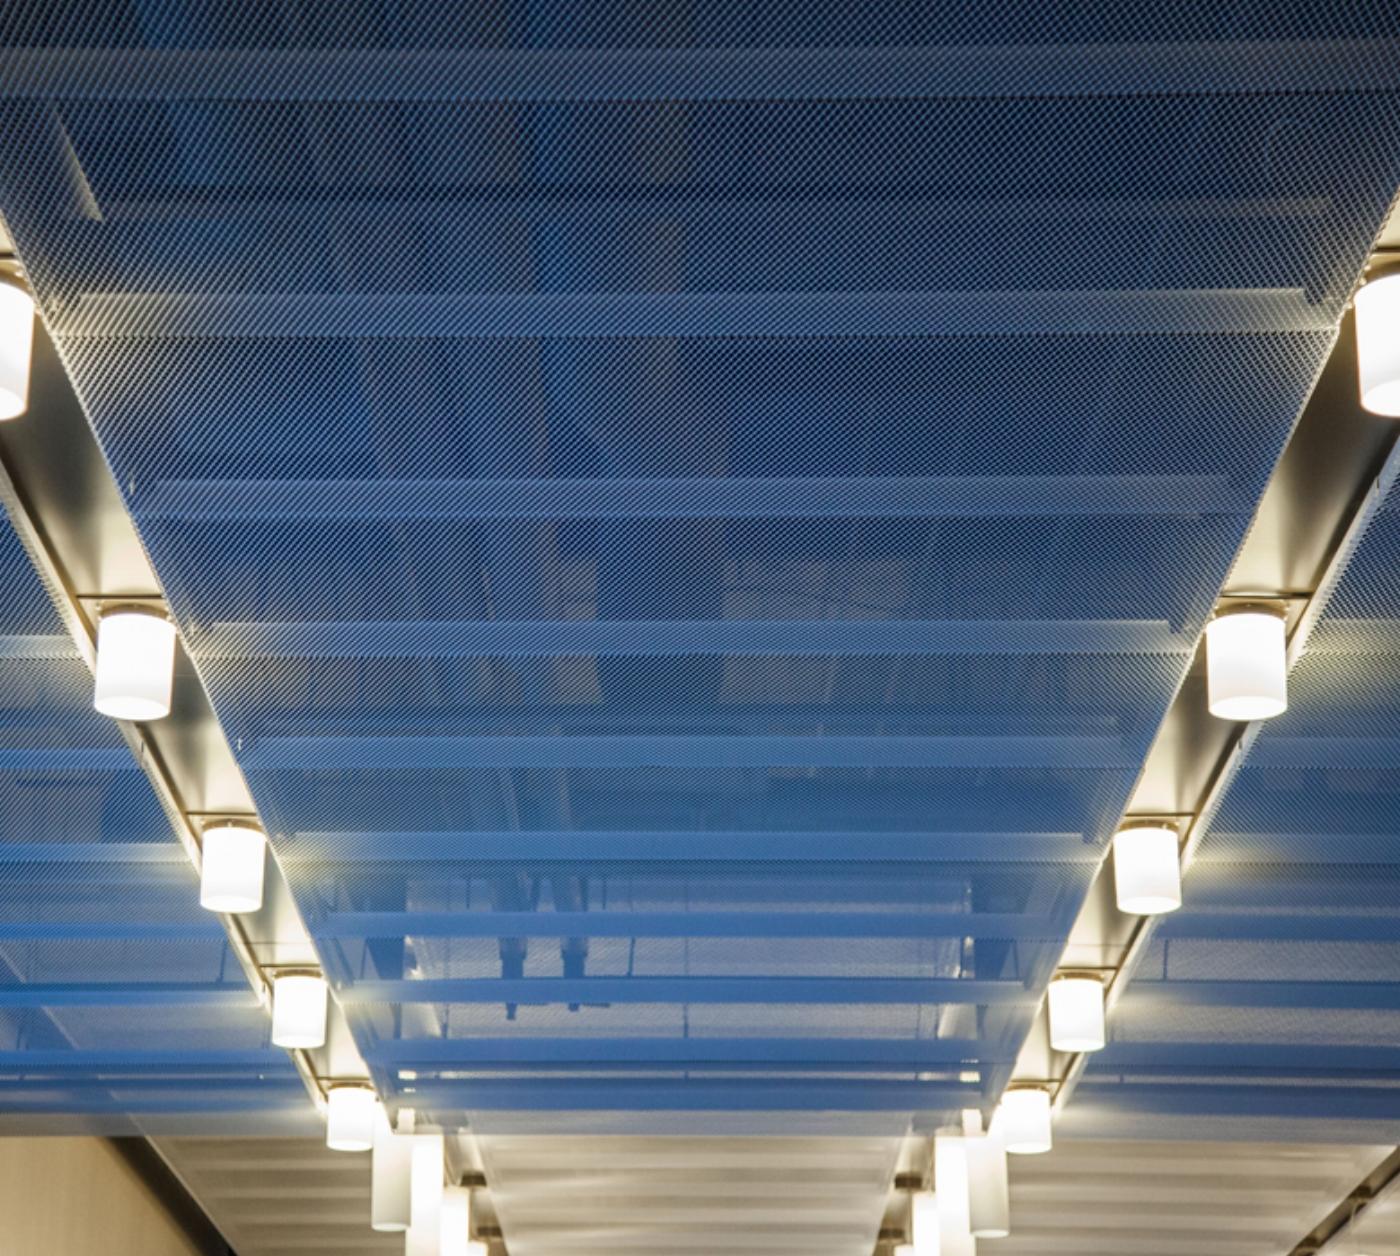 Acoustical ceilings